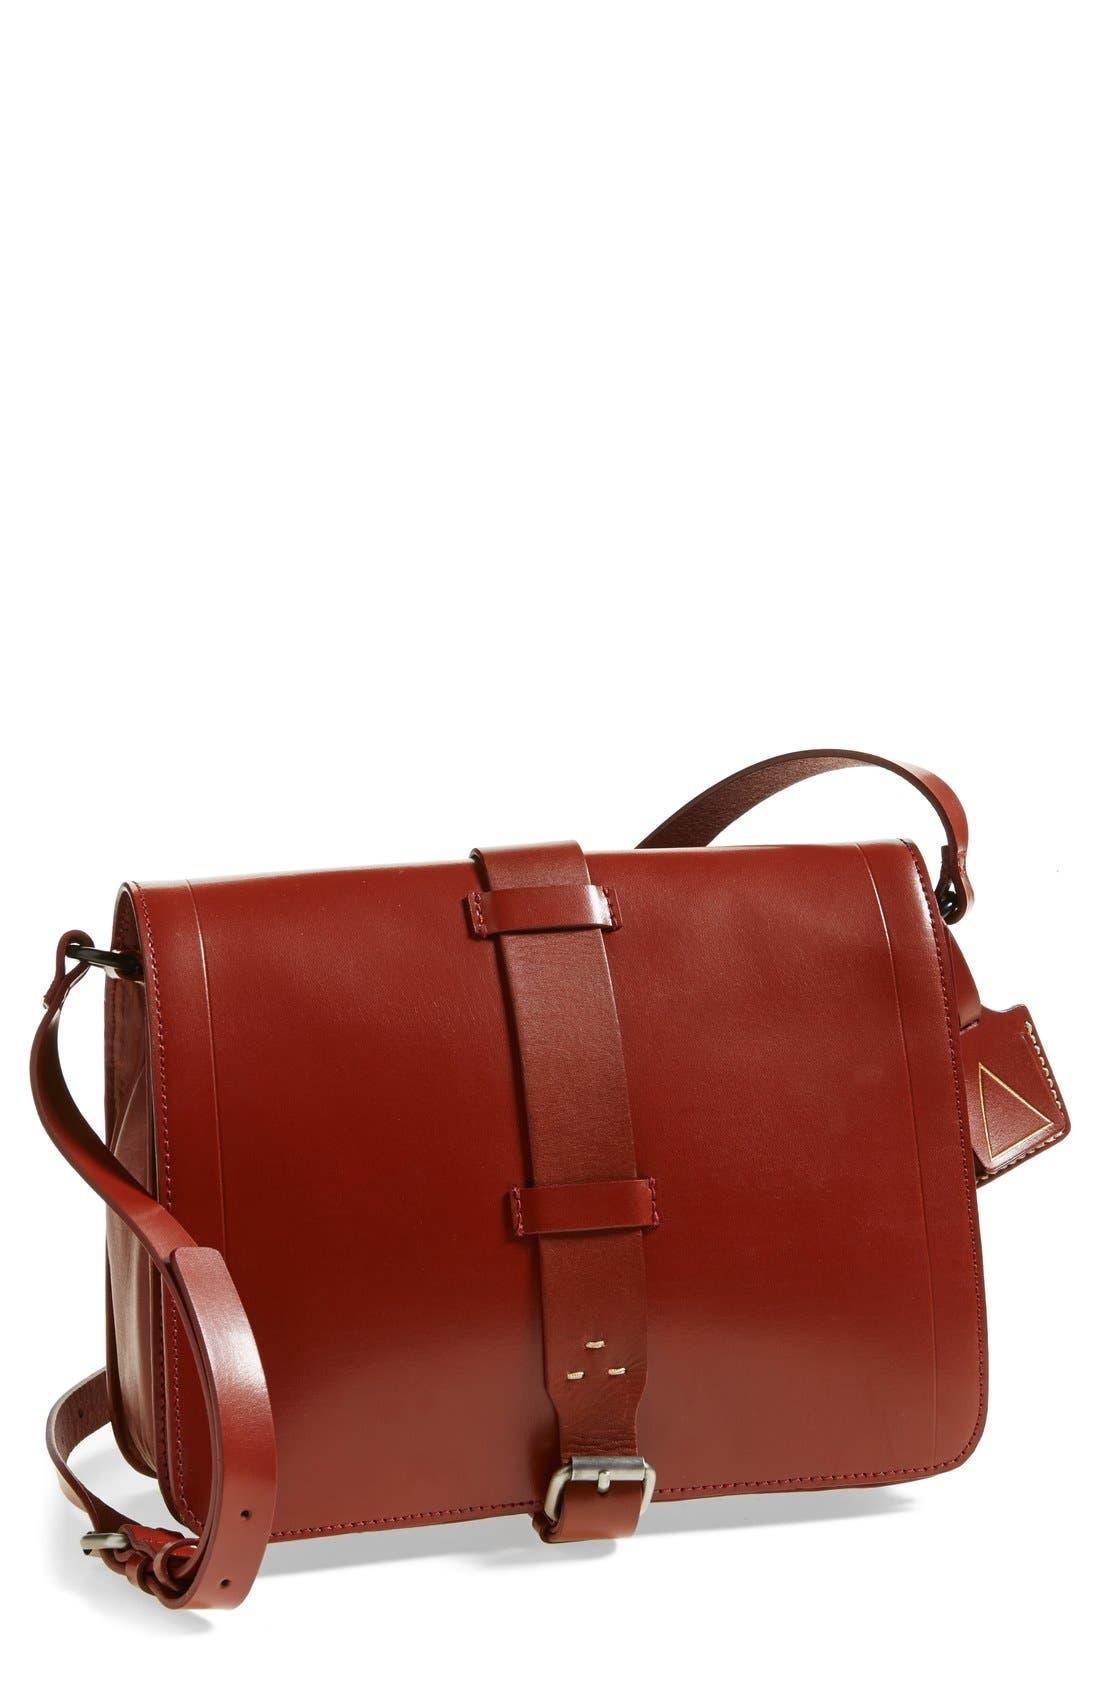 Alternate Image 1 Selected - Kelsi Dagger Brooklyn 'Courier' Leather Crossbody Bag